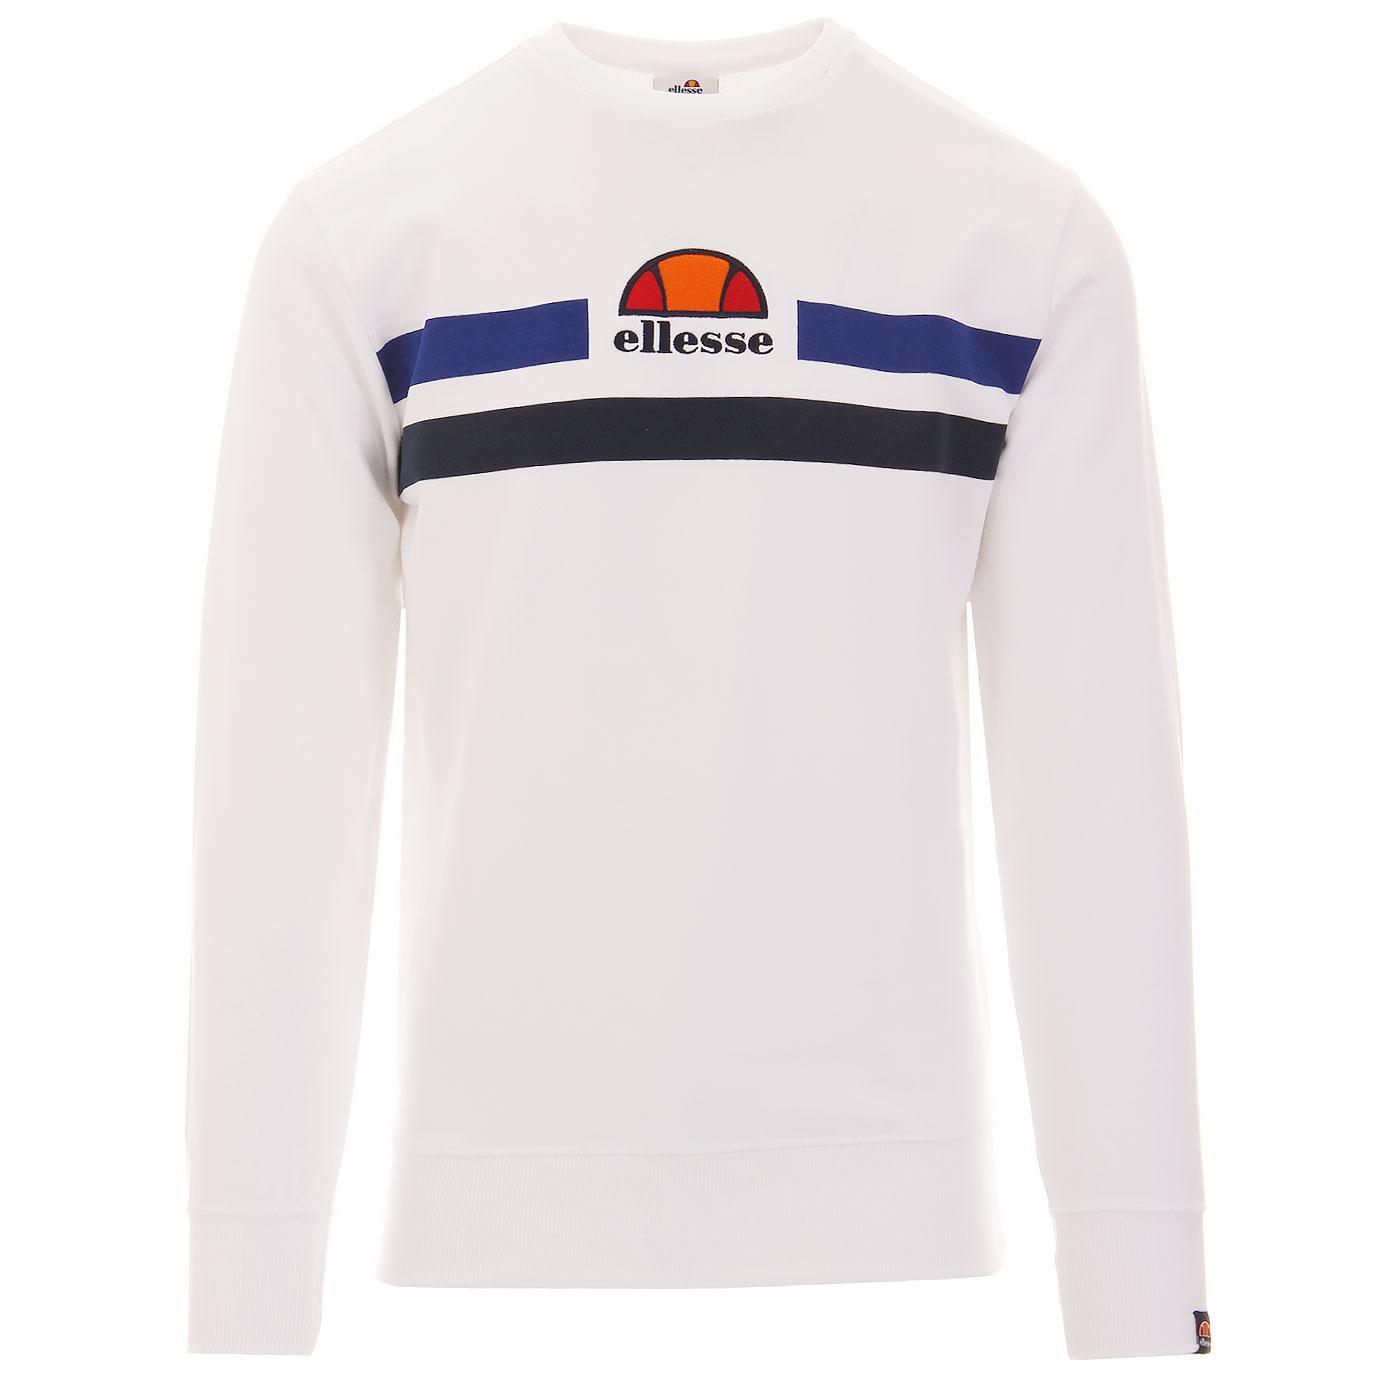 Vete ELLESSE Men's Retro Eighties Sweatshirt WHITE